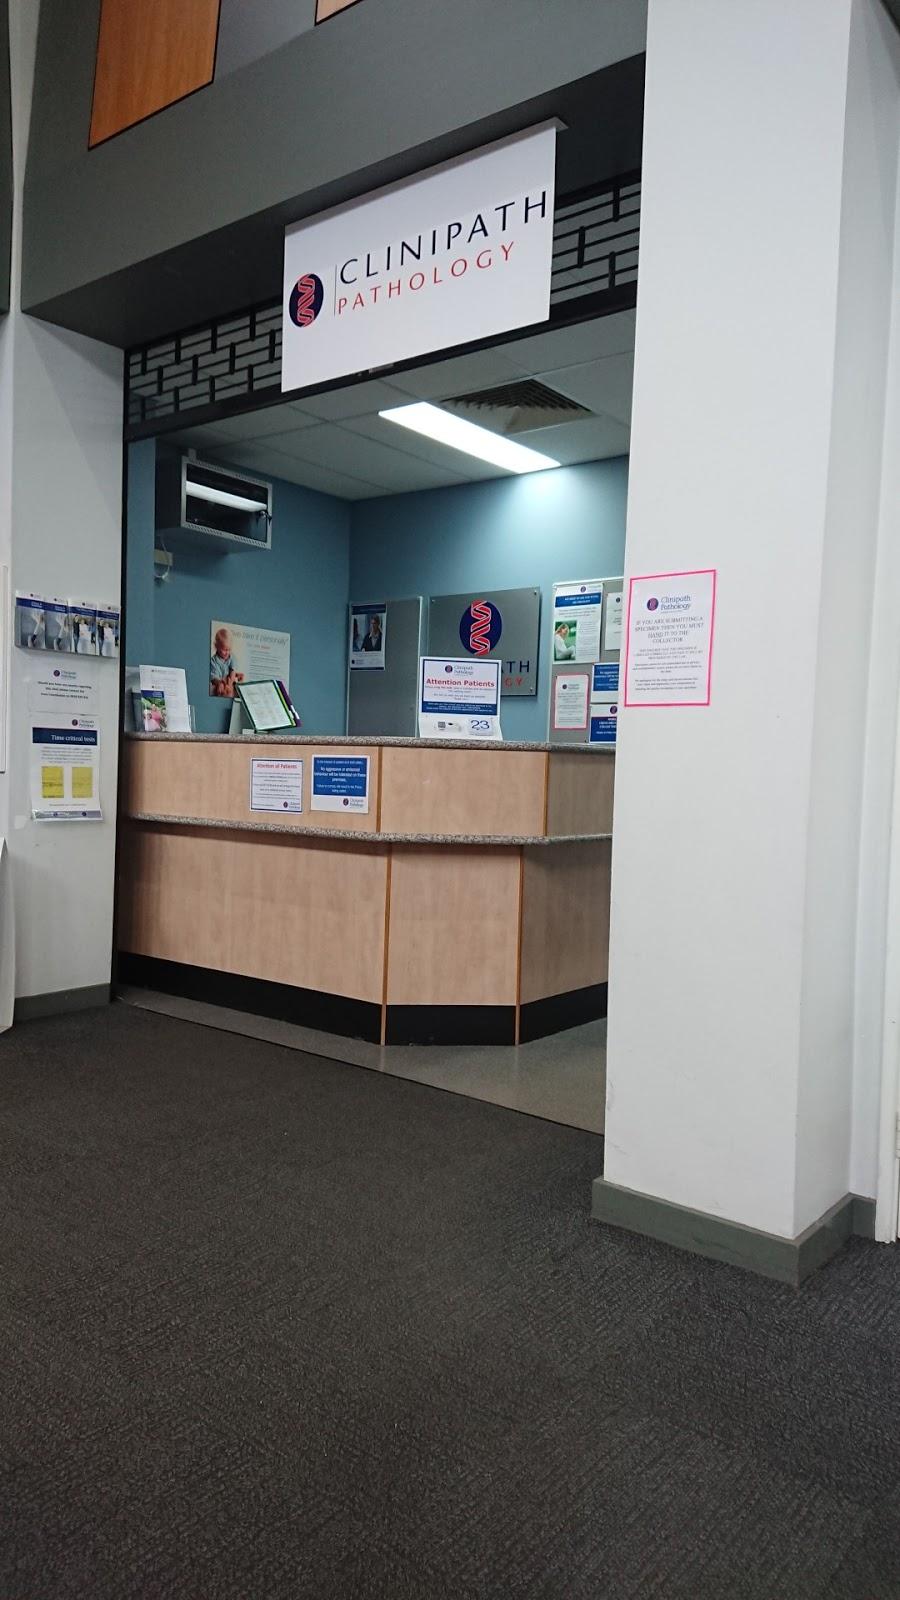 Clinipath Pathology | hospital | Cnr Collier and, Walter Rd W, Morley WA 6062, Australia | 0892754606 OR +61 8 9275 4606